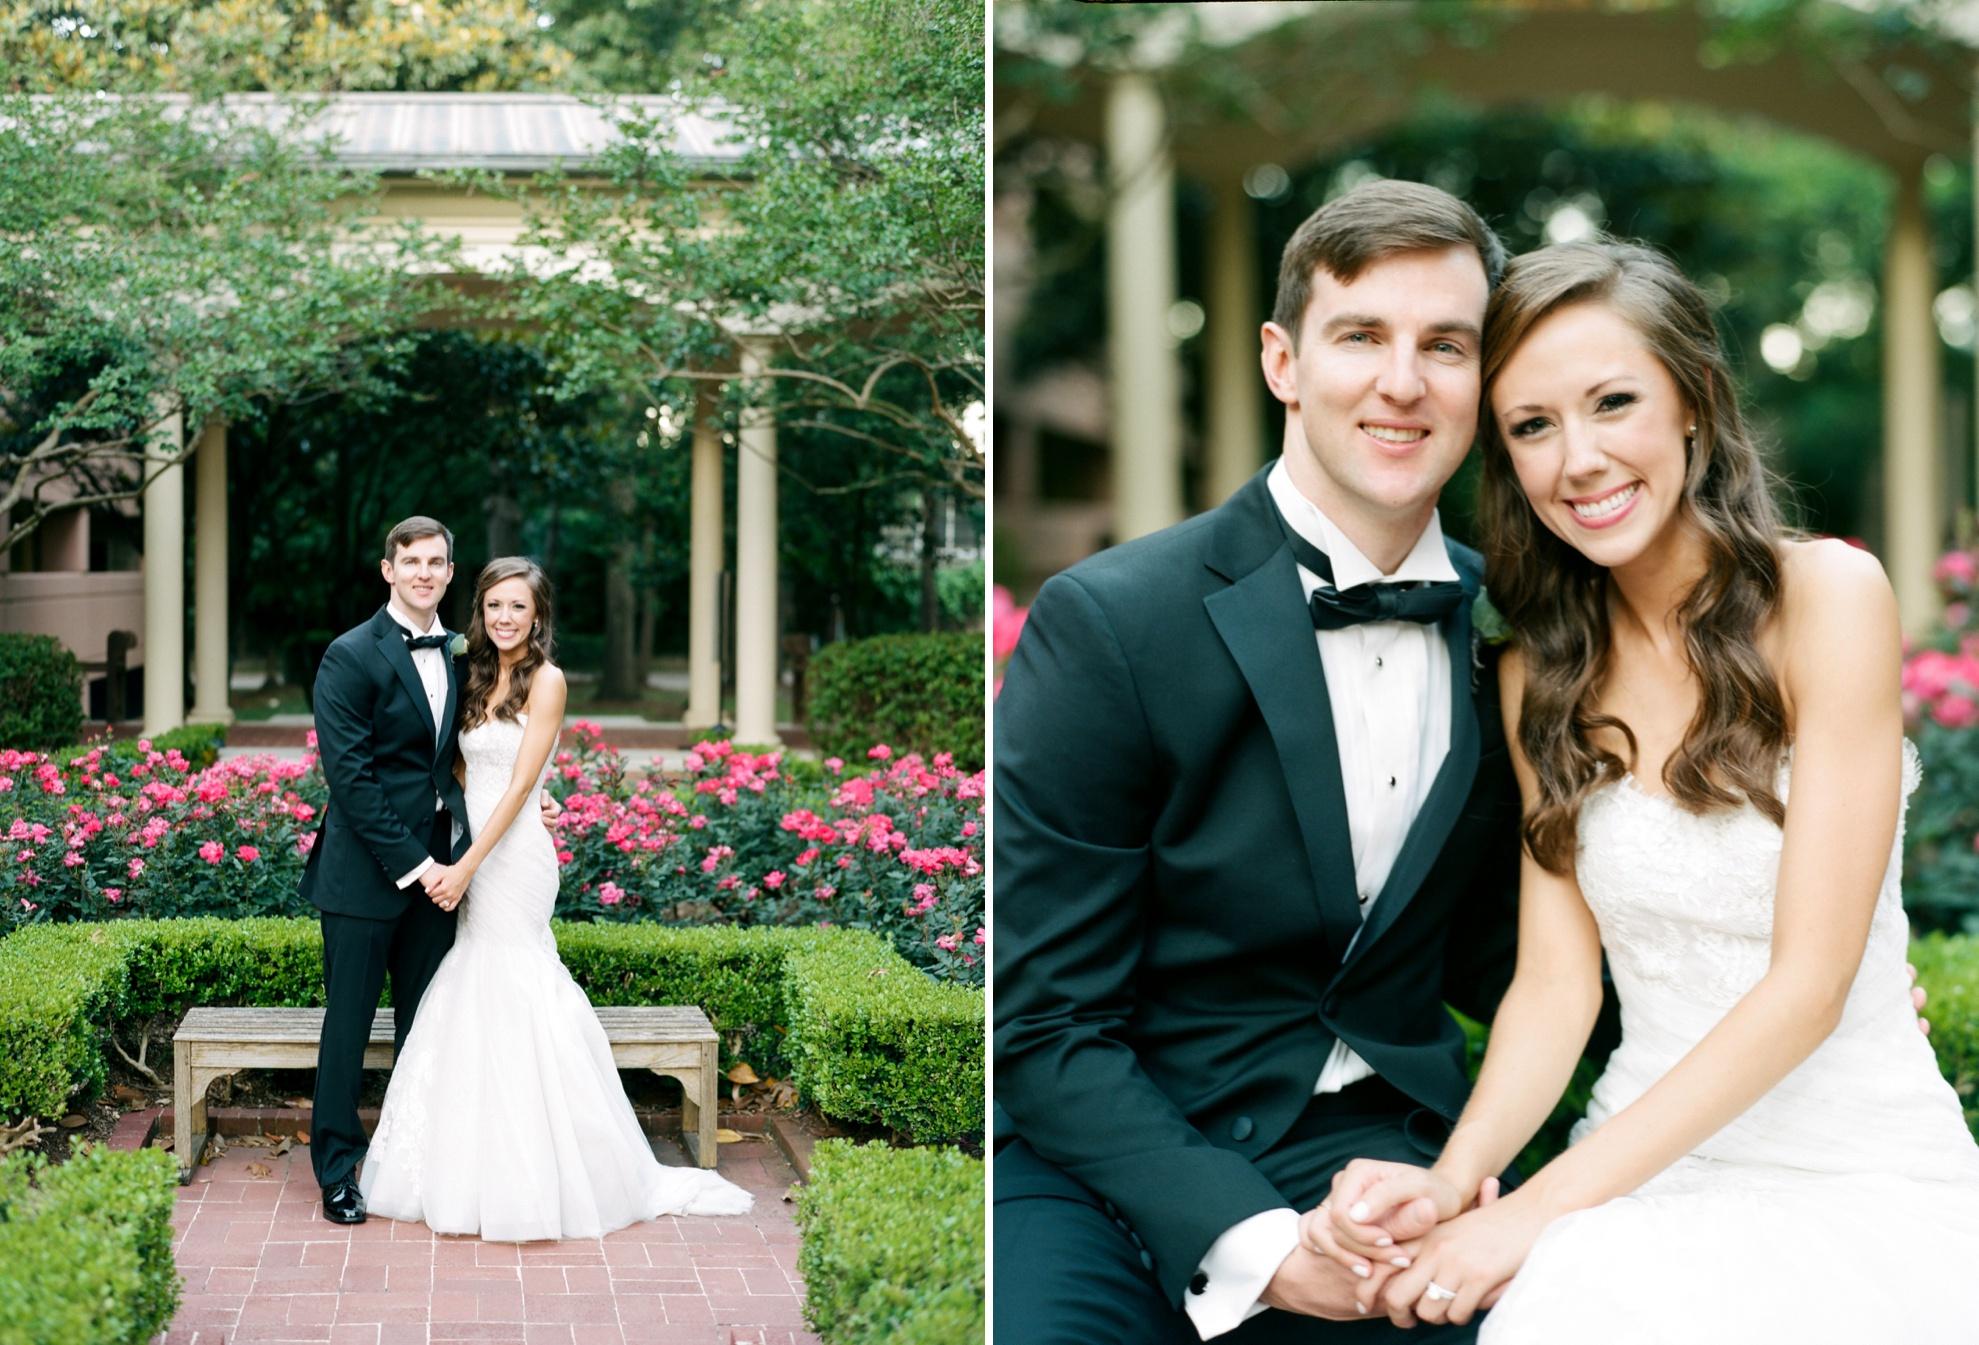 The-Junior-League-Houston-Chapter-Wedding-Reception-Dana-Fernandez-Photography-Film-Venue.jpg